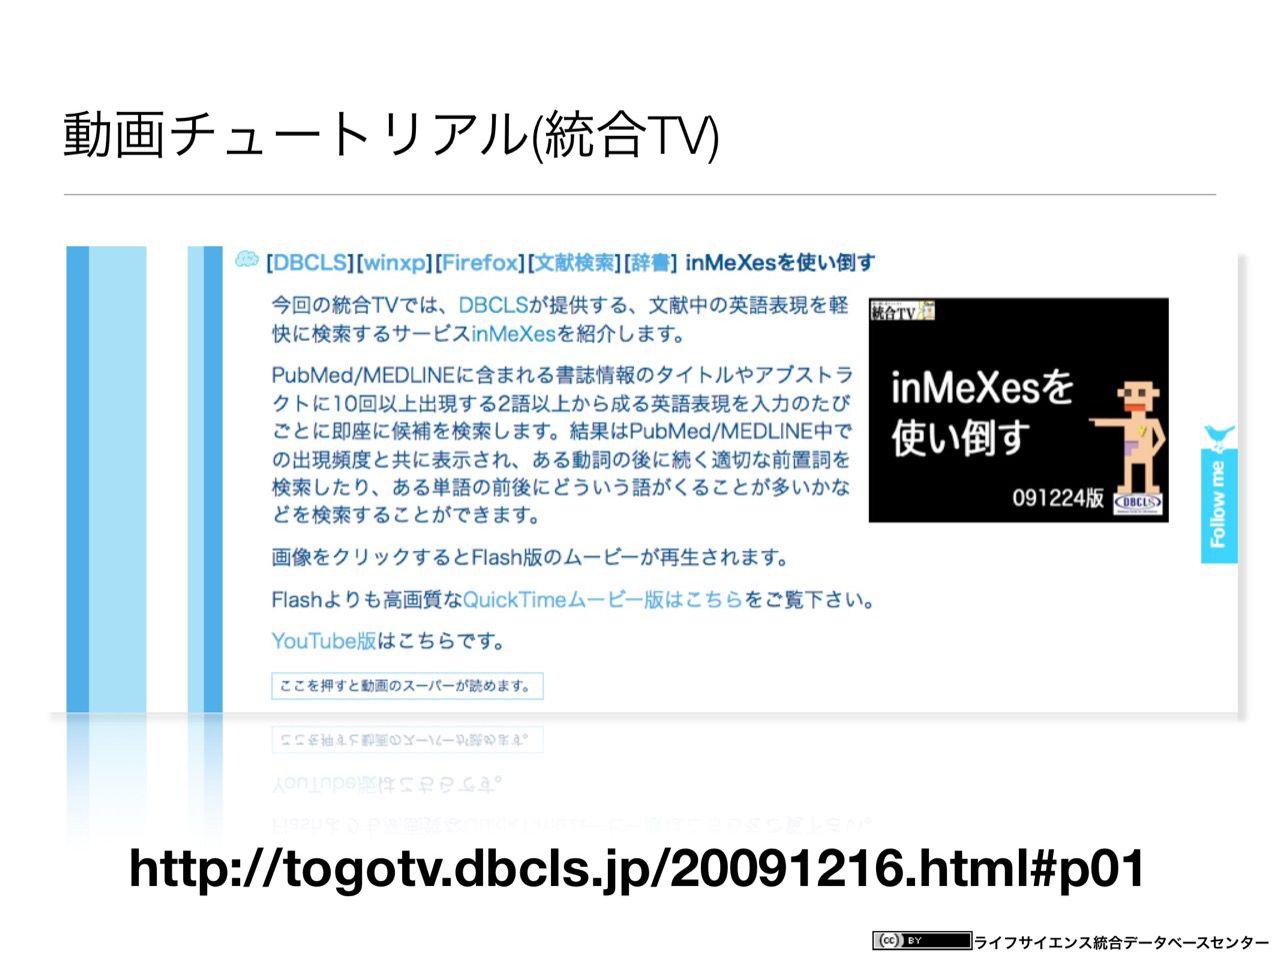 images/AJACS60_yamamoto_056.jpg